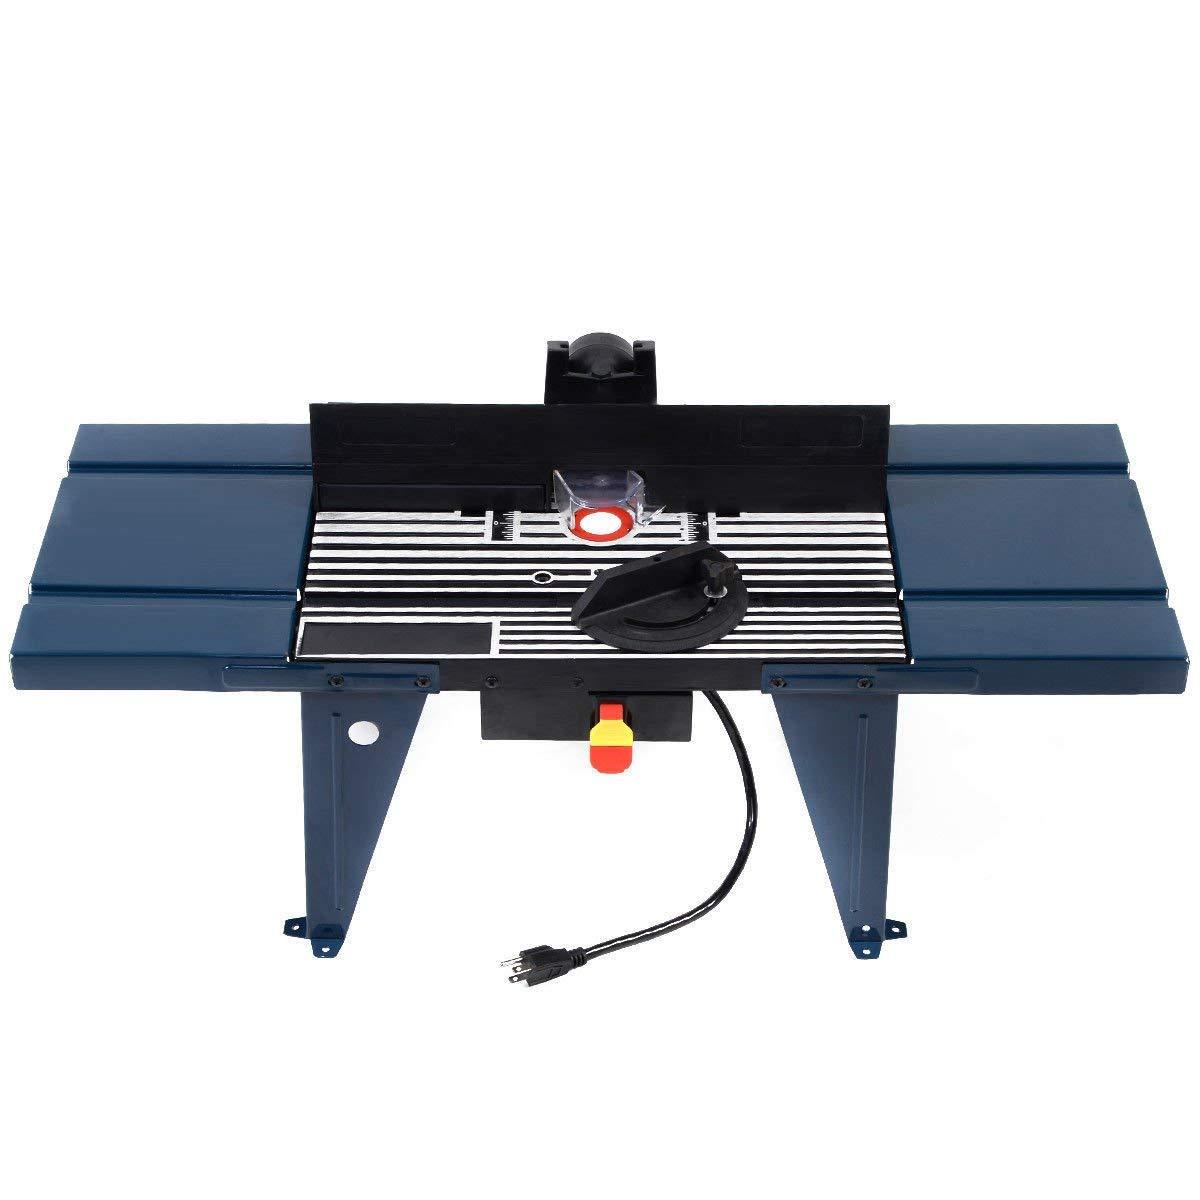 Admirable Cheap Bosch Ra1181 Benchtop Router Table Find Bosch Ra1181 Interior Design Ideas Ghosoteloinfo